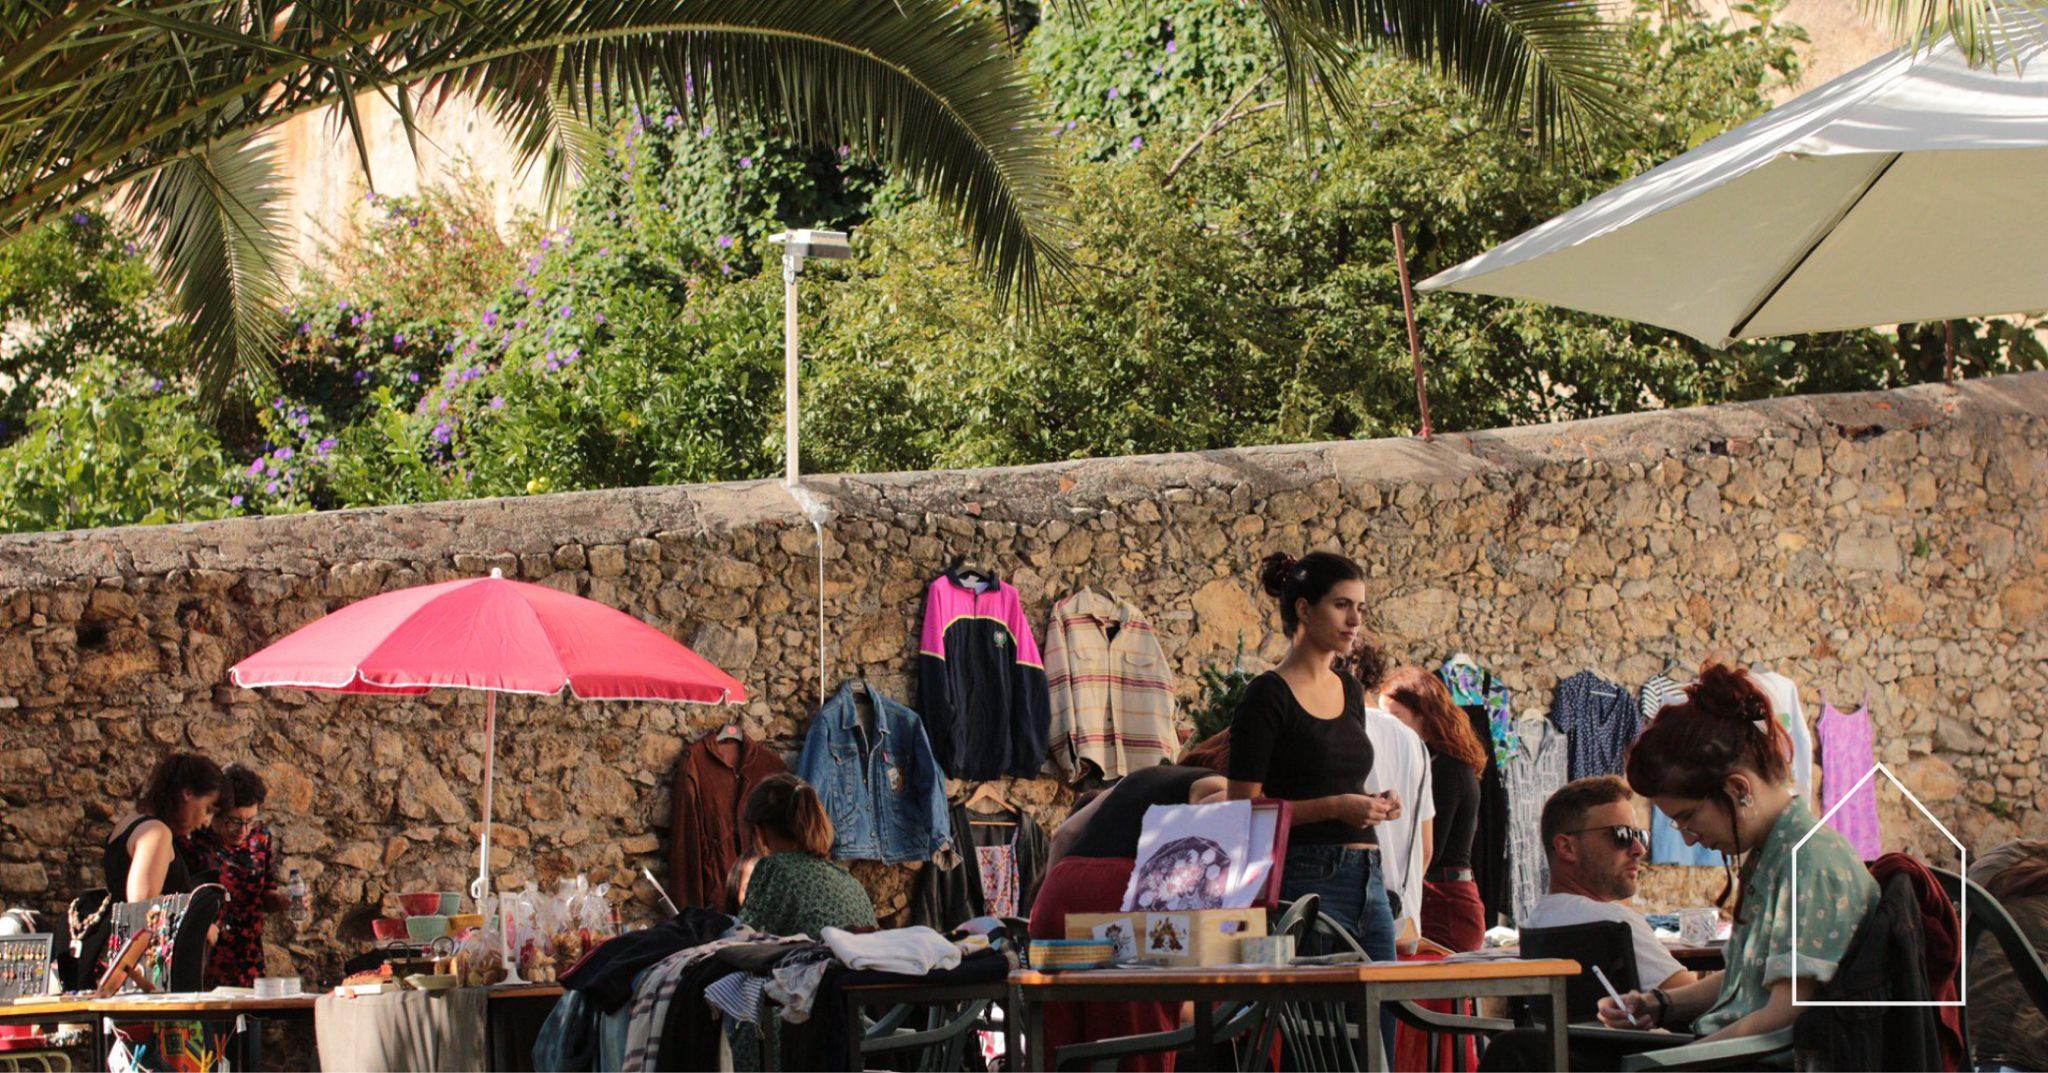 Mercado de Trocas